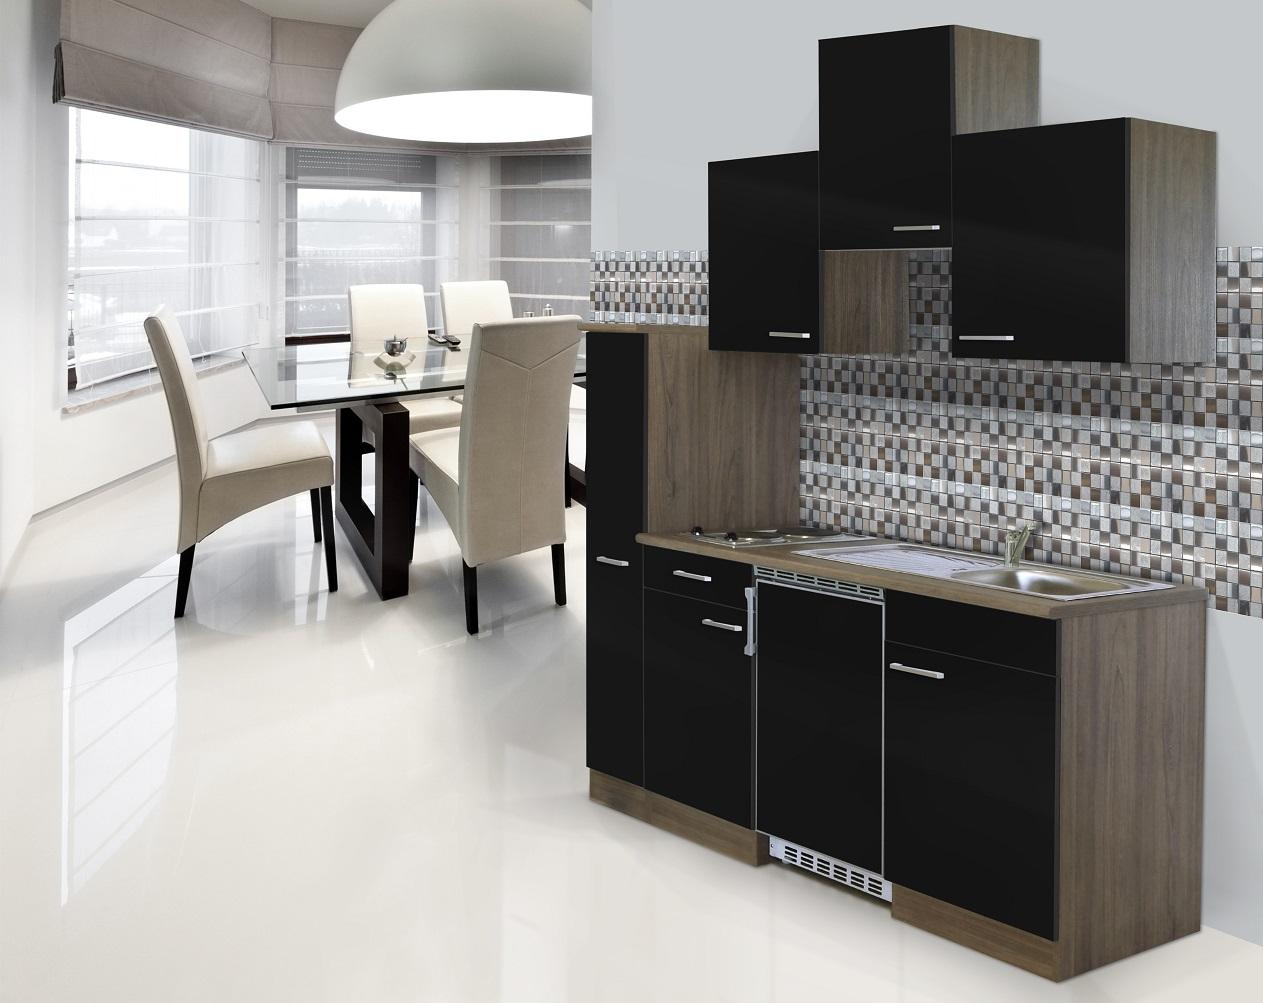 respekta singlek che k che k chenzeile minik che 180 cm eiche york schwarz ceran ebay. Black Bedroom Furniture Sets. Home Design Ideas